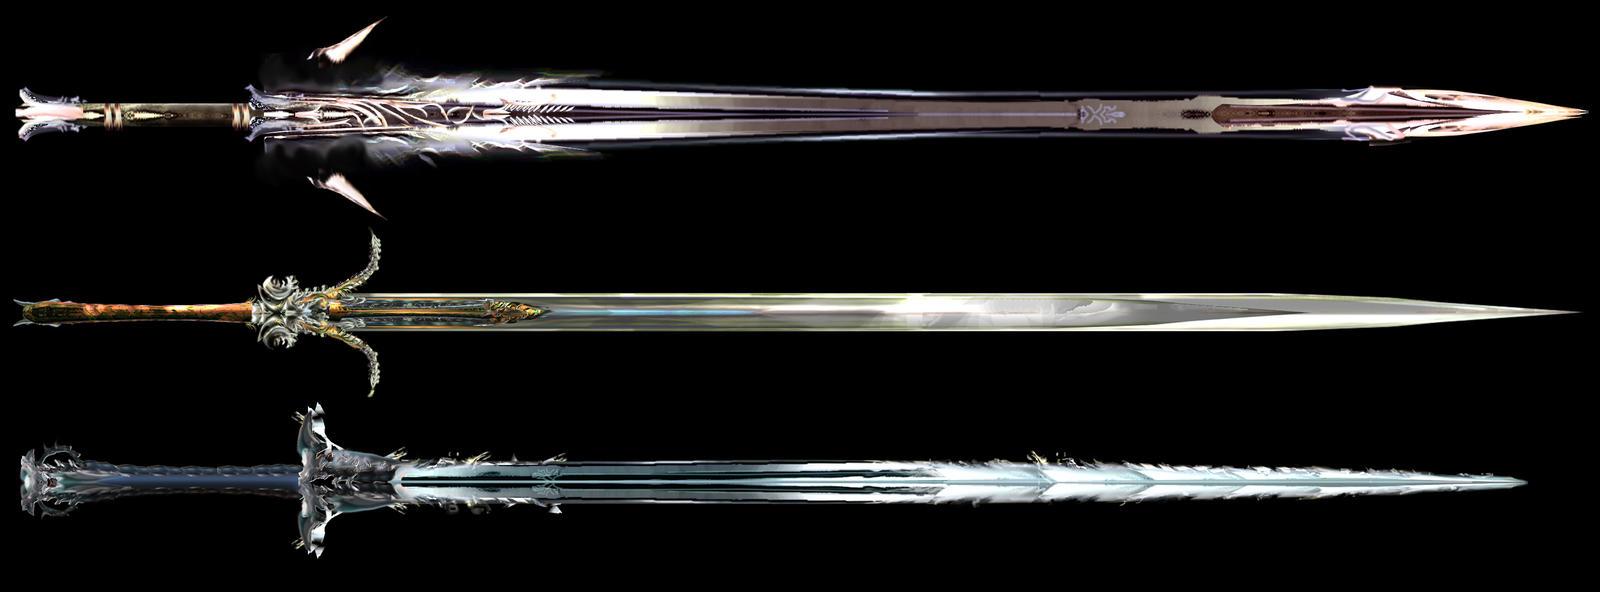 Weaponry 543 by Random223